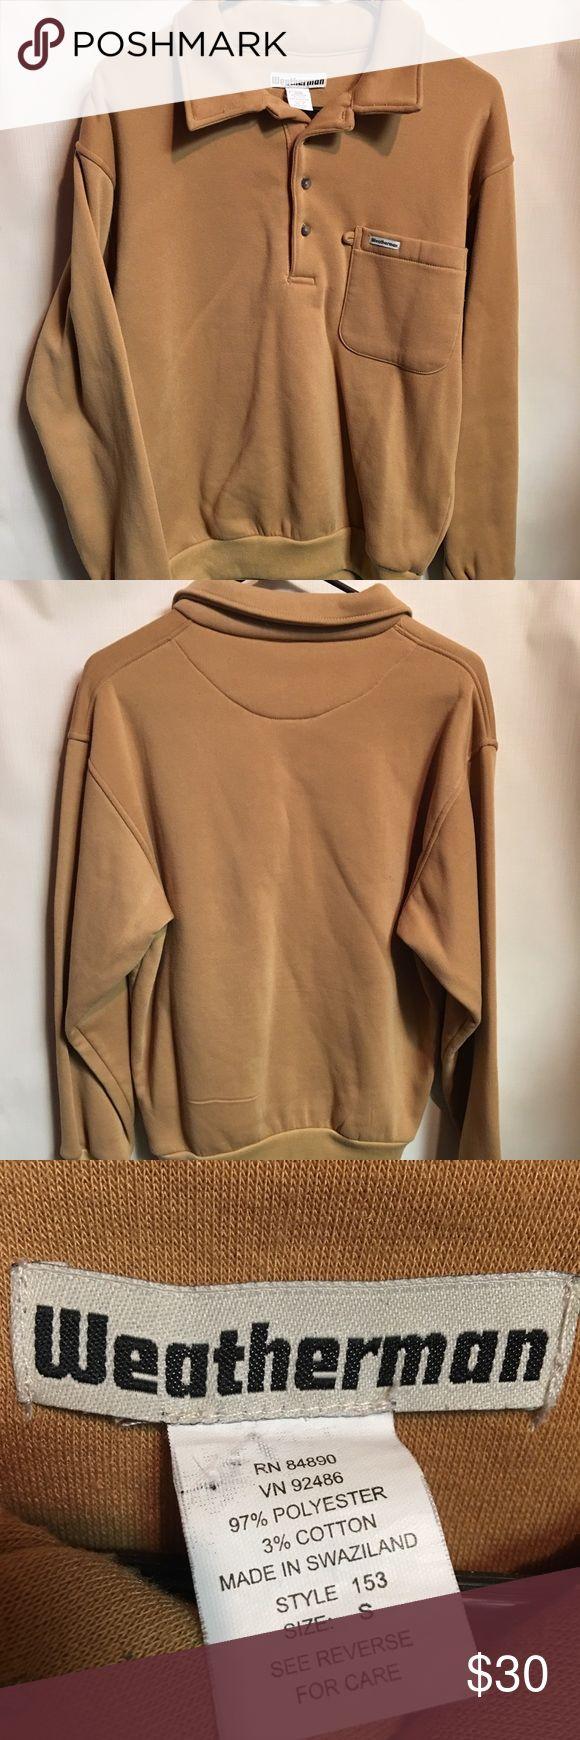 Vintage 80's Men's Small Sweatshirt Vintage Tan Men's Small Button Up Pocket Polo Sweatshirt. In excellent condition with no major flaws Vintage Shirts Sweatshirts & Hoodies